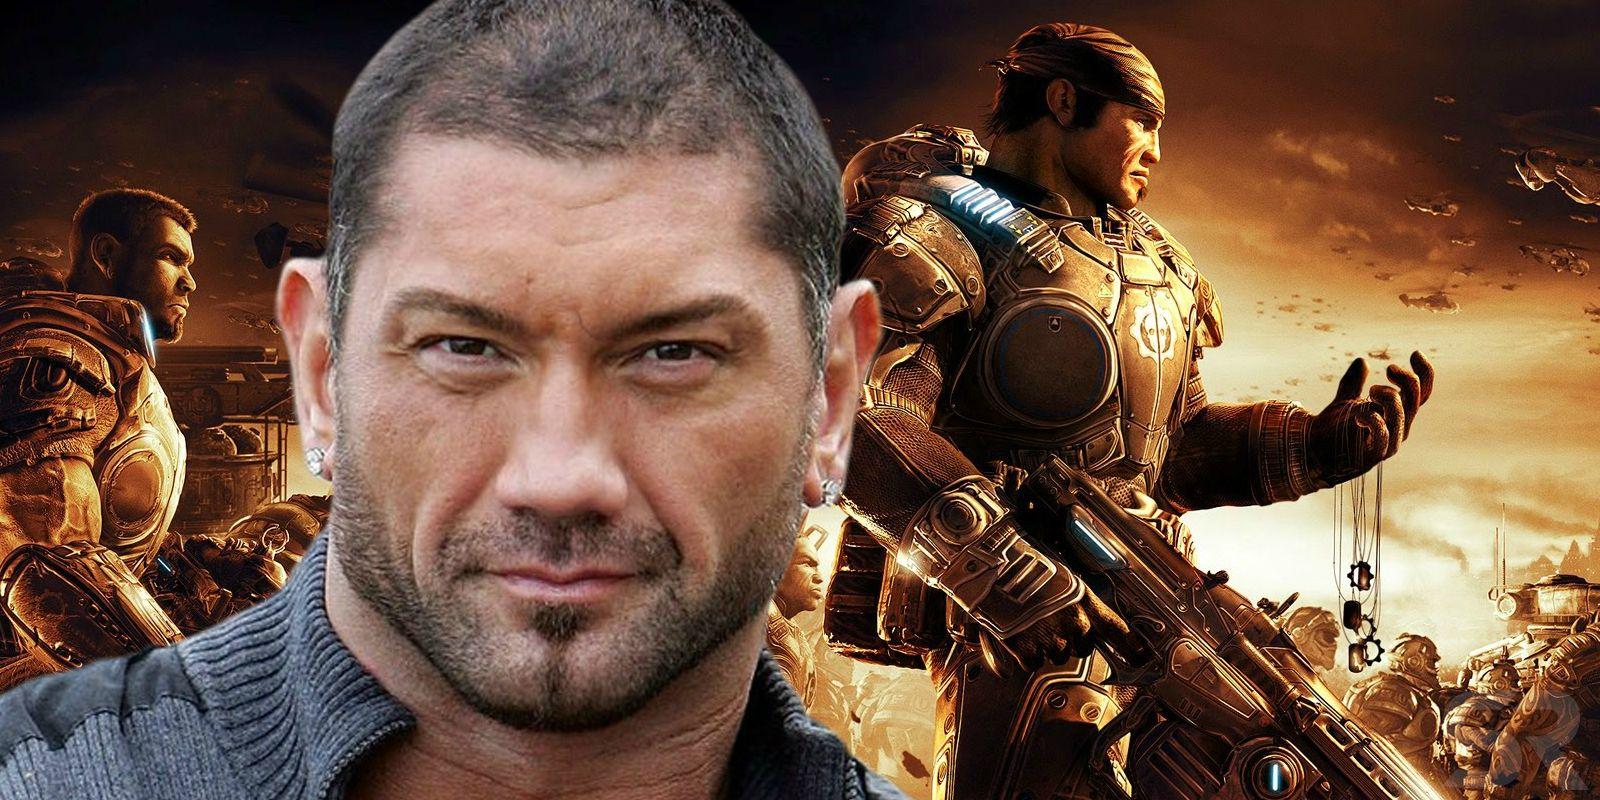 Dave Bautista Wants Marcus Fenix Role In Gears Of War Movie